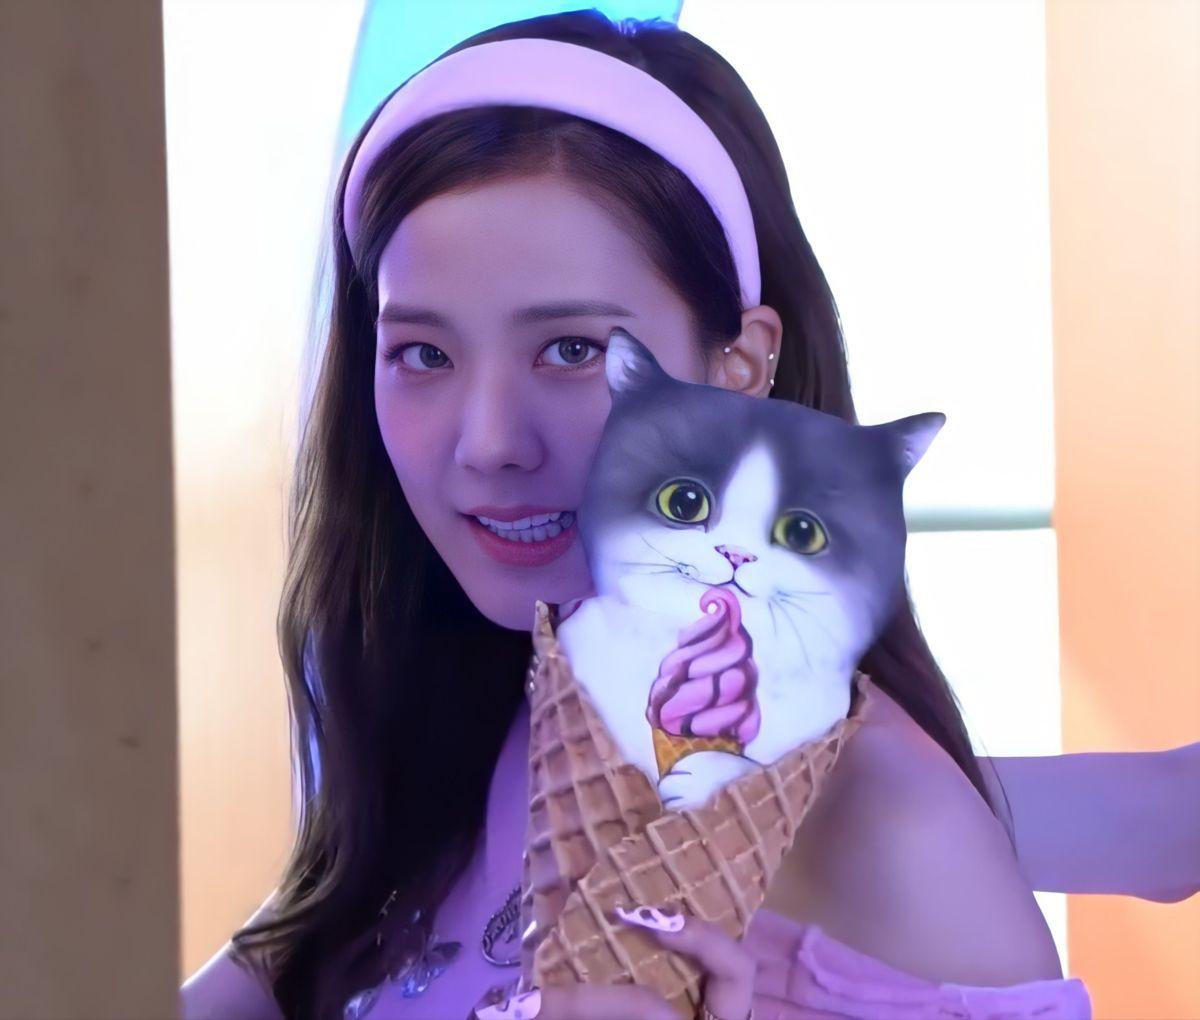 جيسو Jisoo Cat Ears Zelda Characters Character